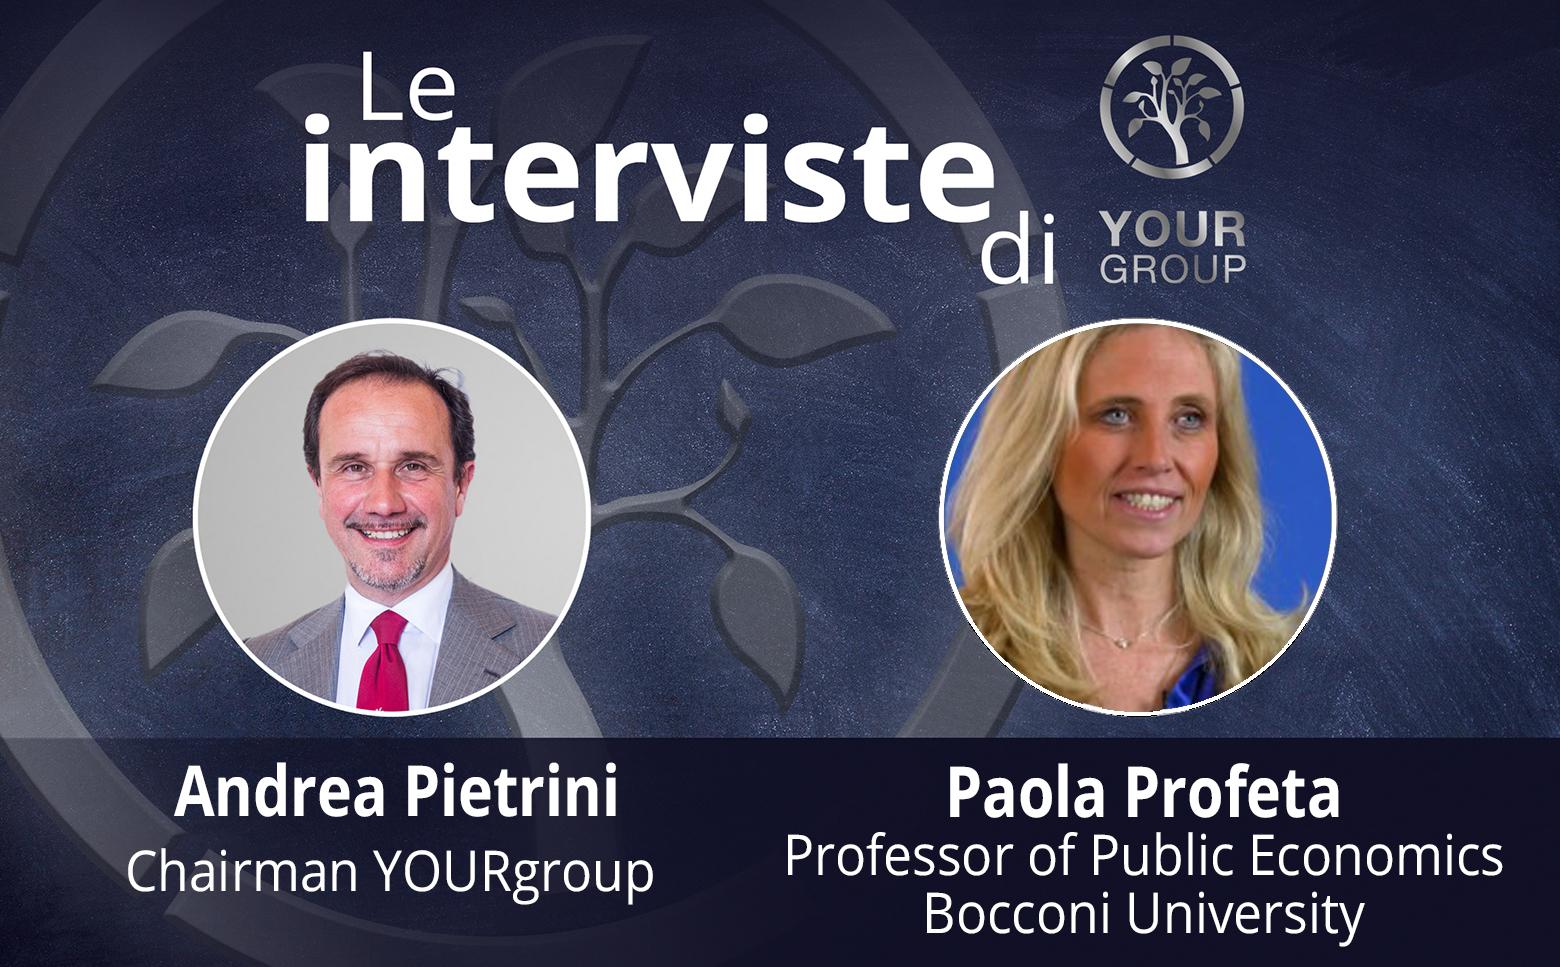 Paola-Profeta-YOURgroup